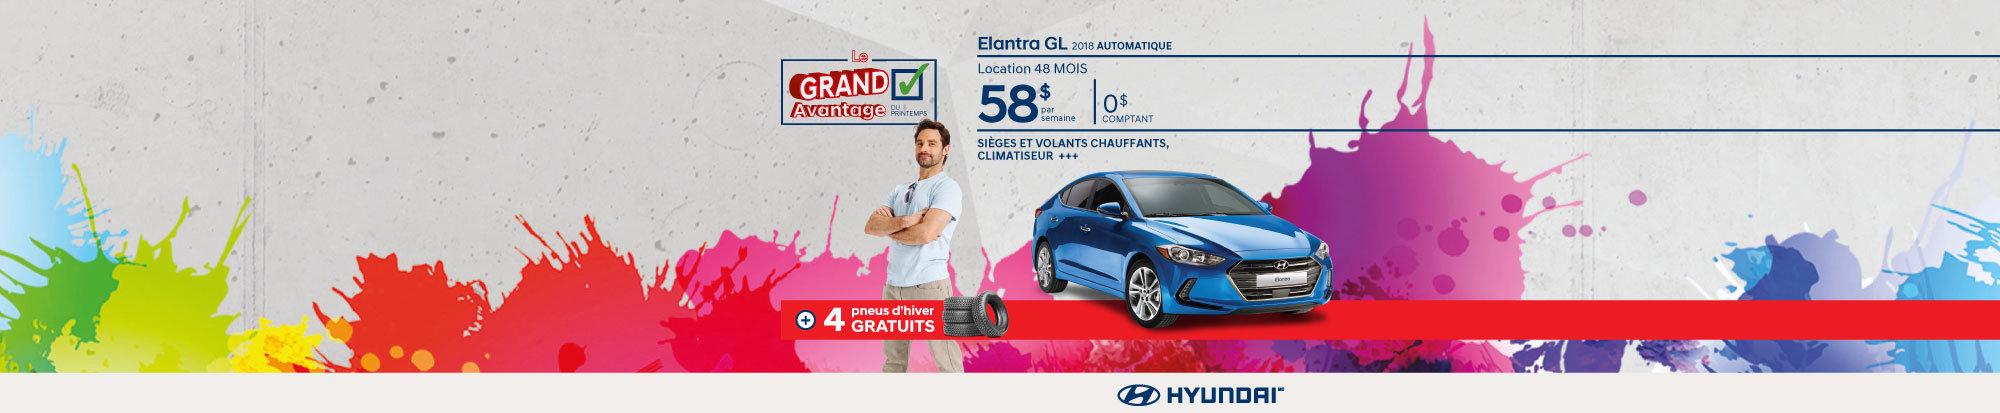 Hyundai Elantra 2018 web